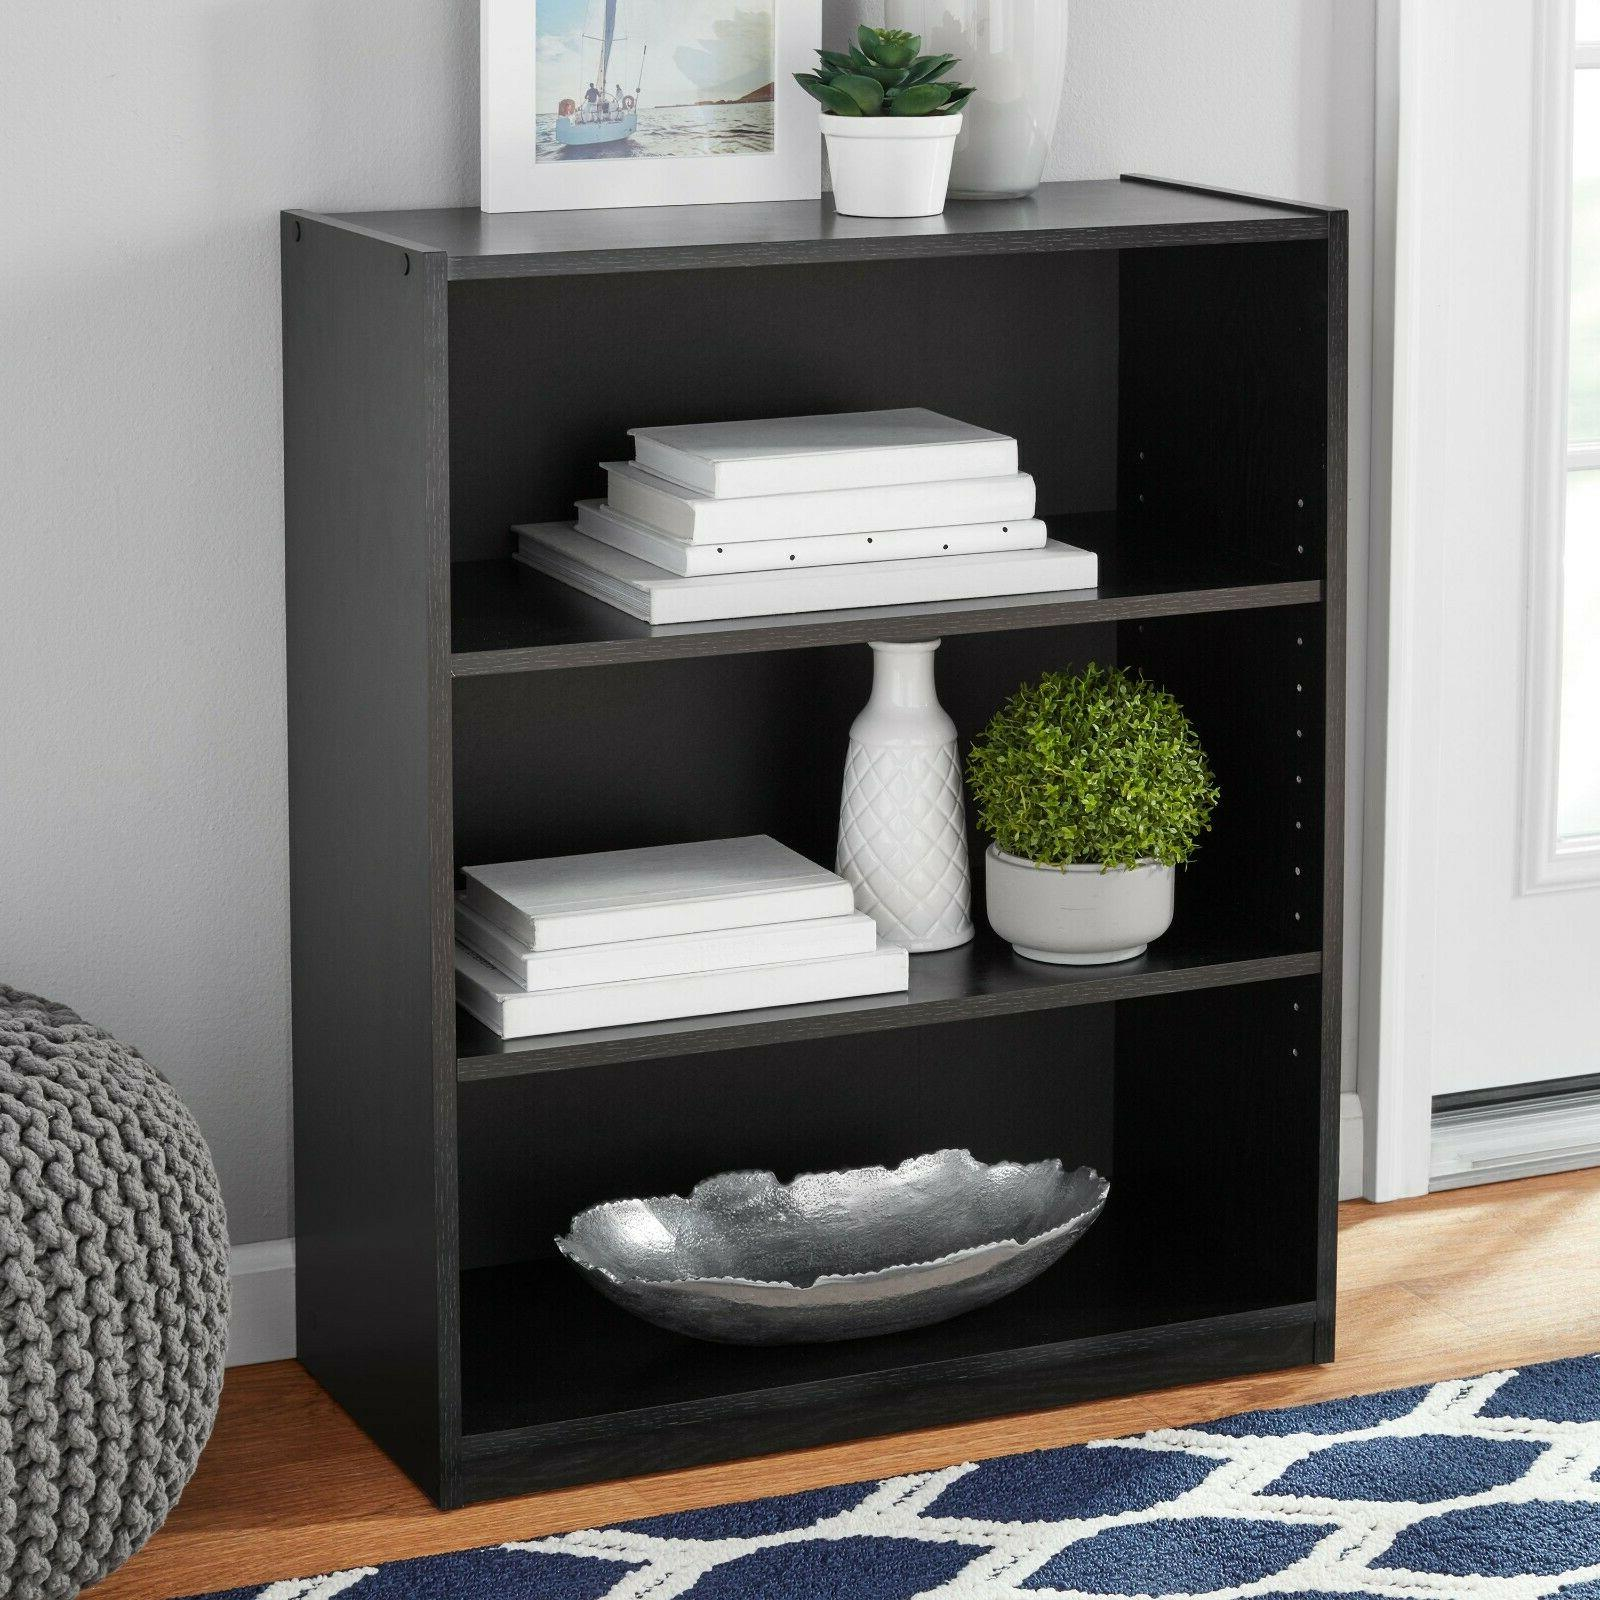 "31"" Tall 3 Wood Storage Book Case Bookshelf"